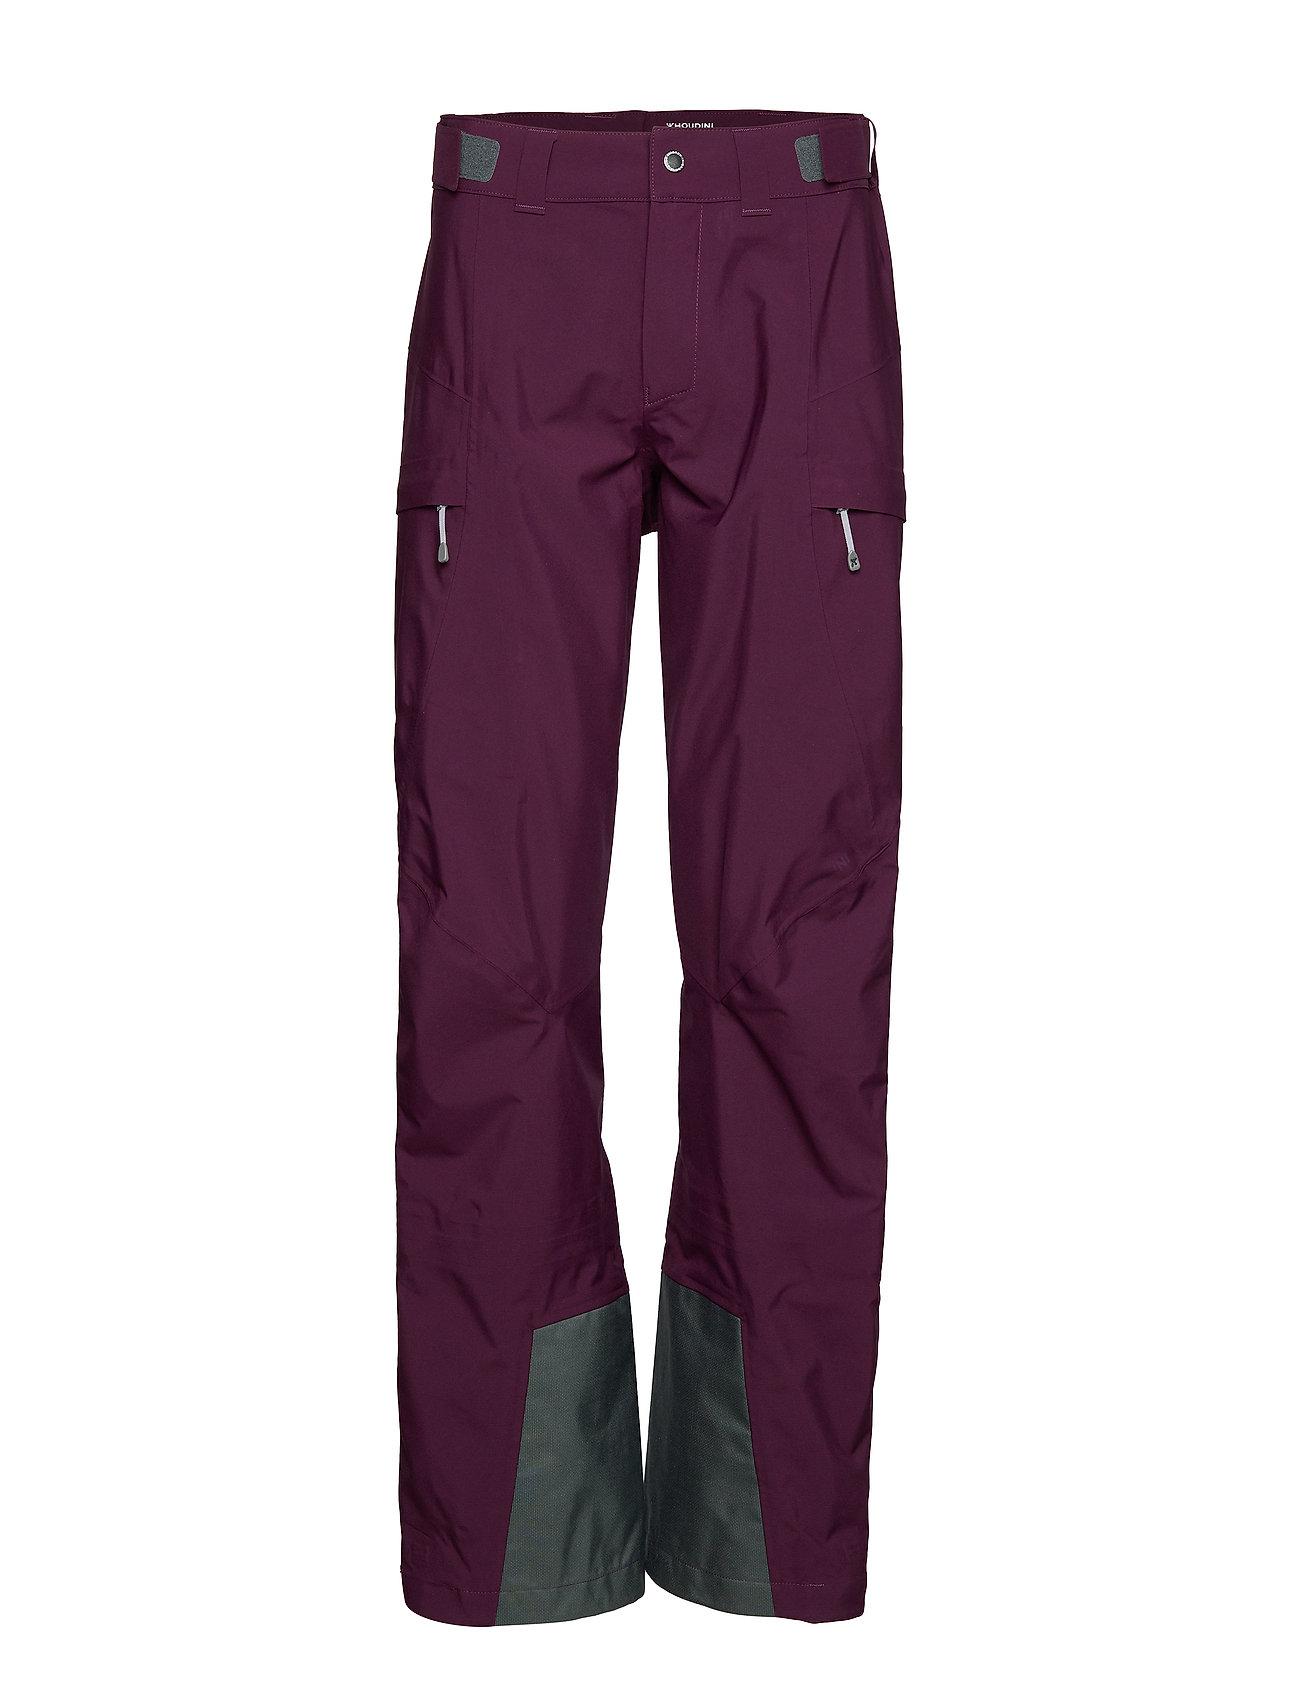 Image of W'S Angular Pant Sport Pants Lilla Houdini (3252228285)